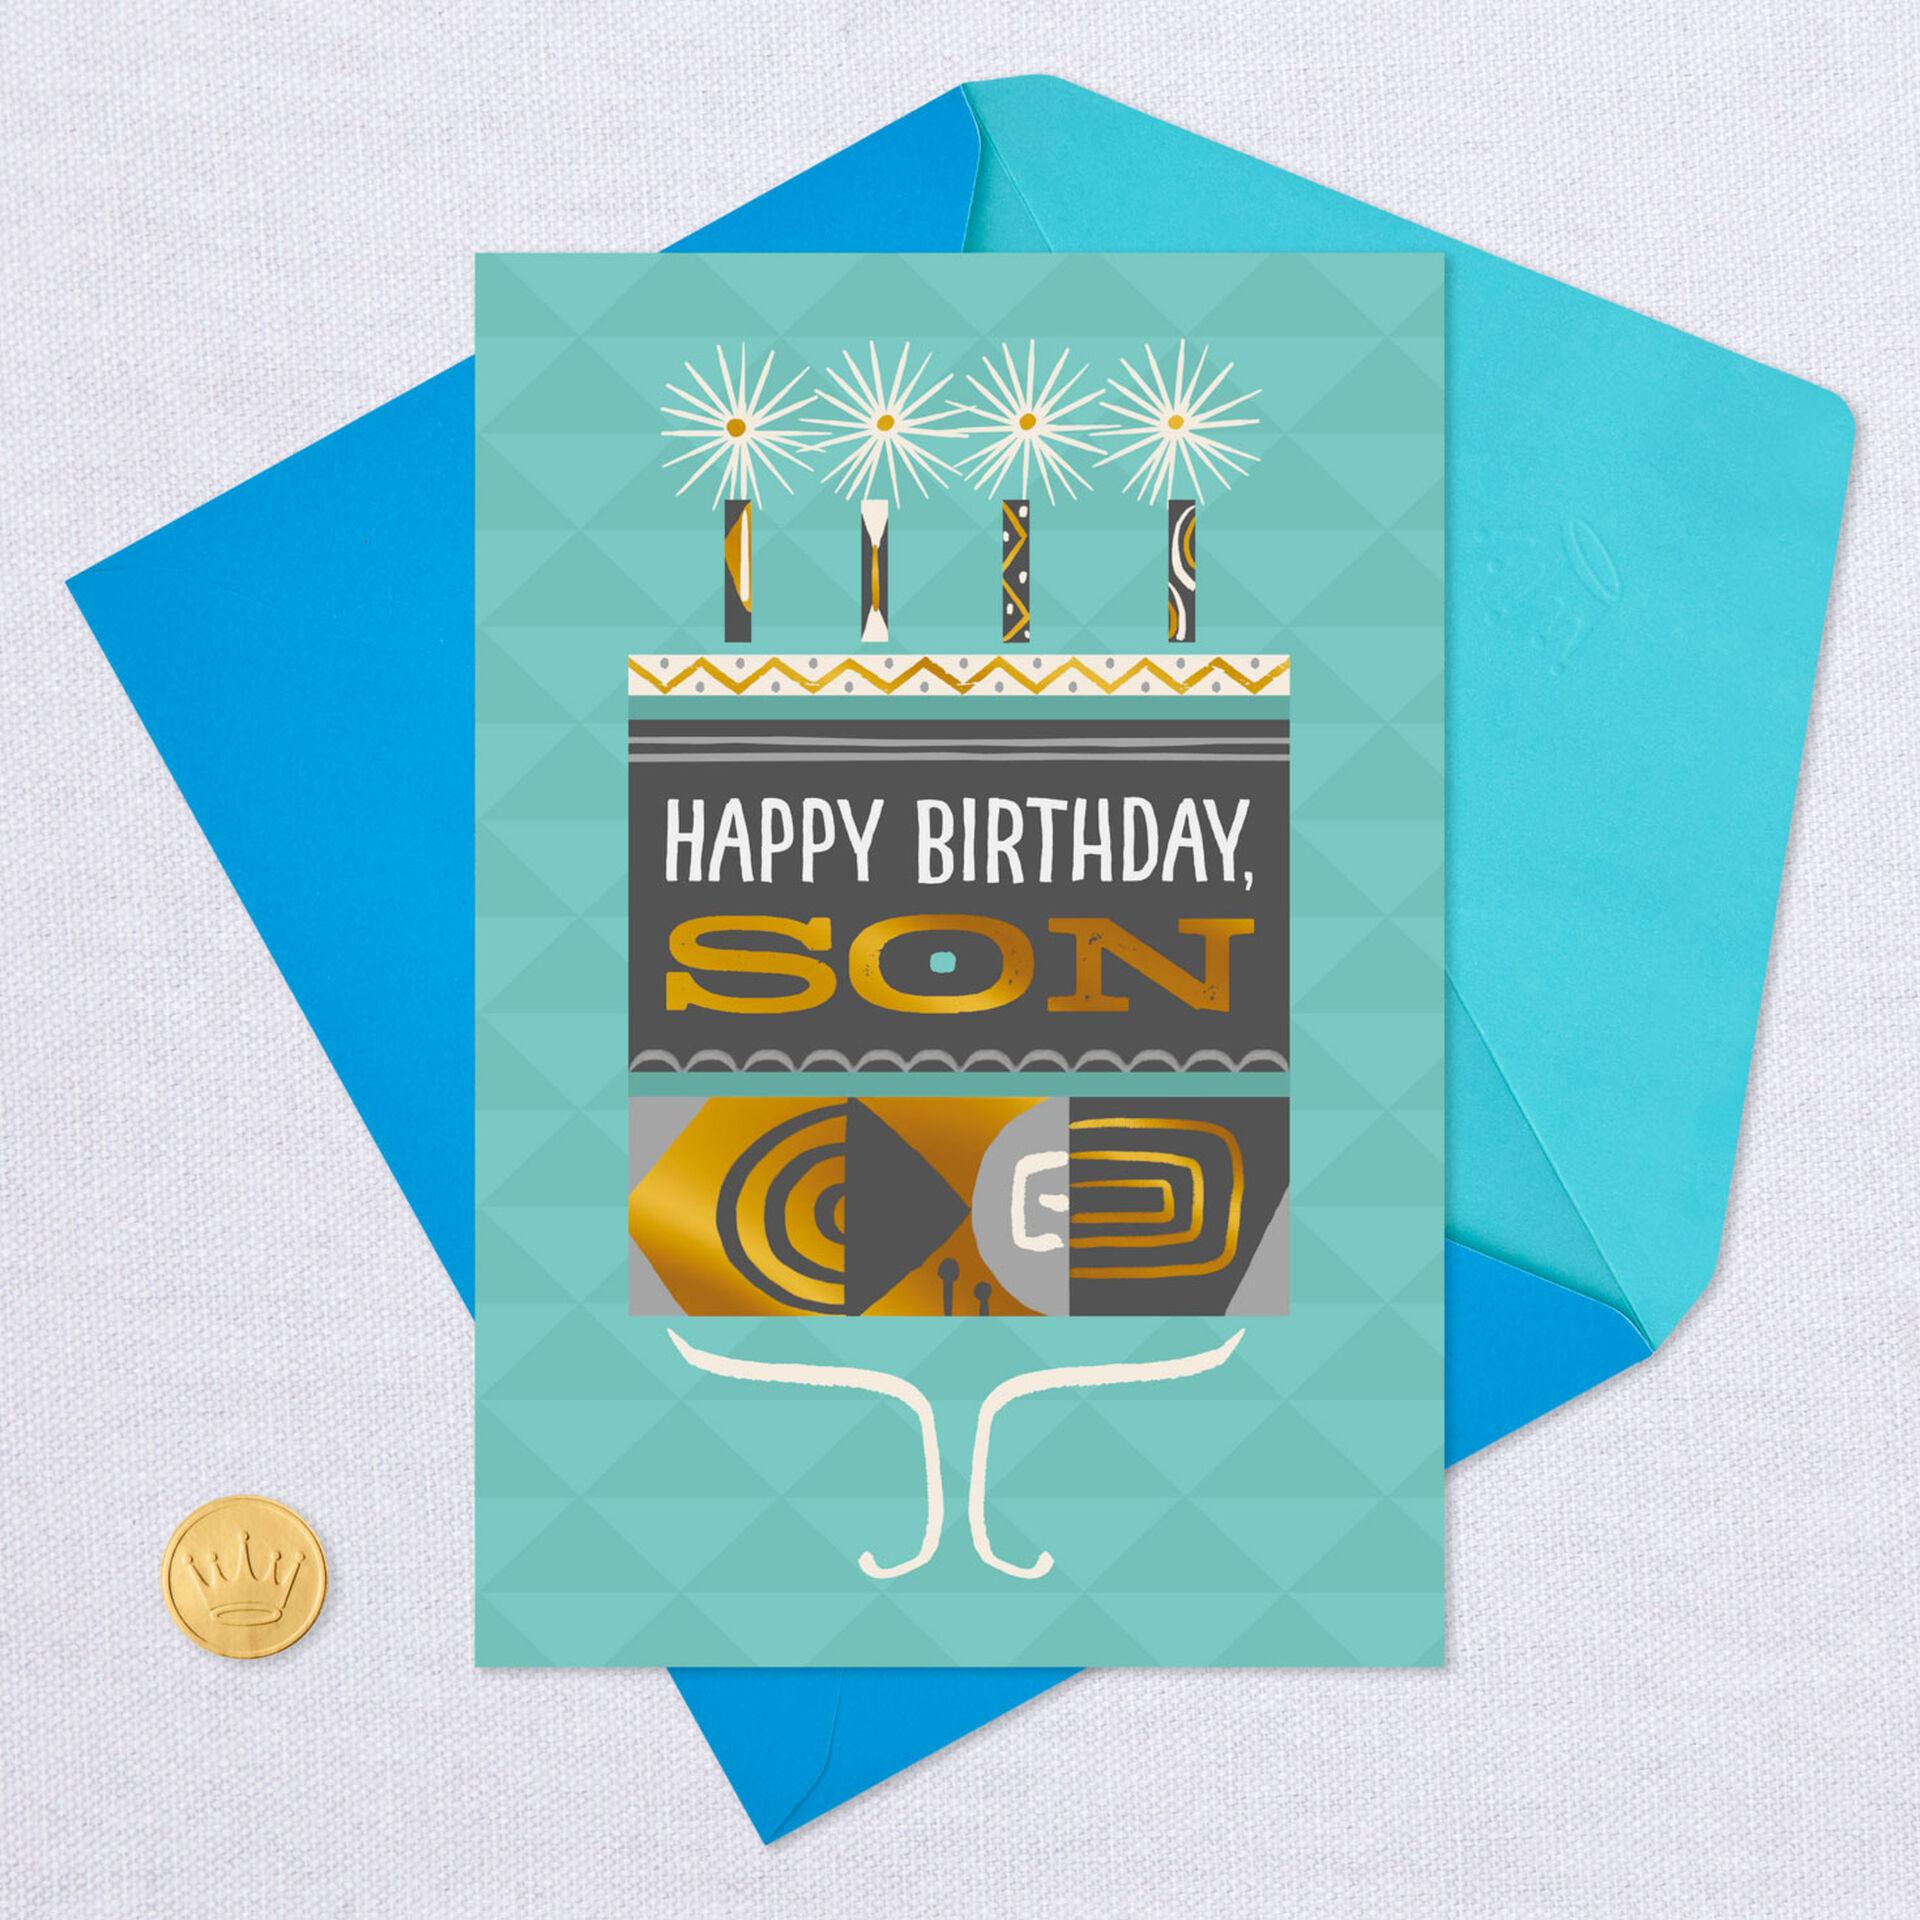 Happy Birthday Son Staying Close No Matter How Far Apart Hallmark Greeting Card